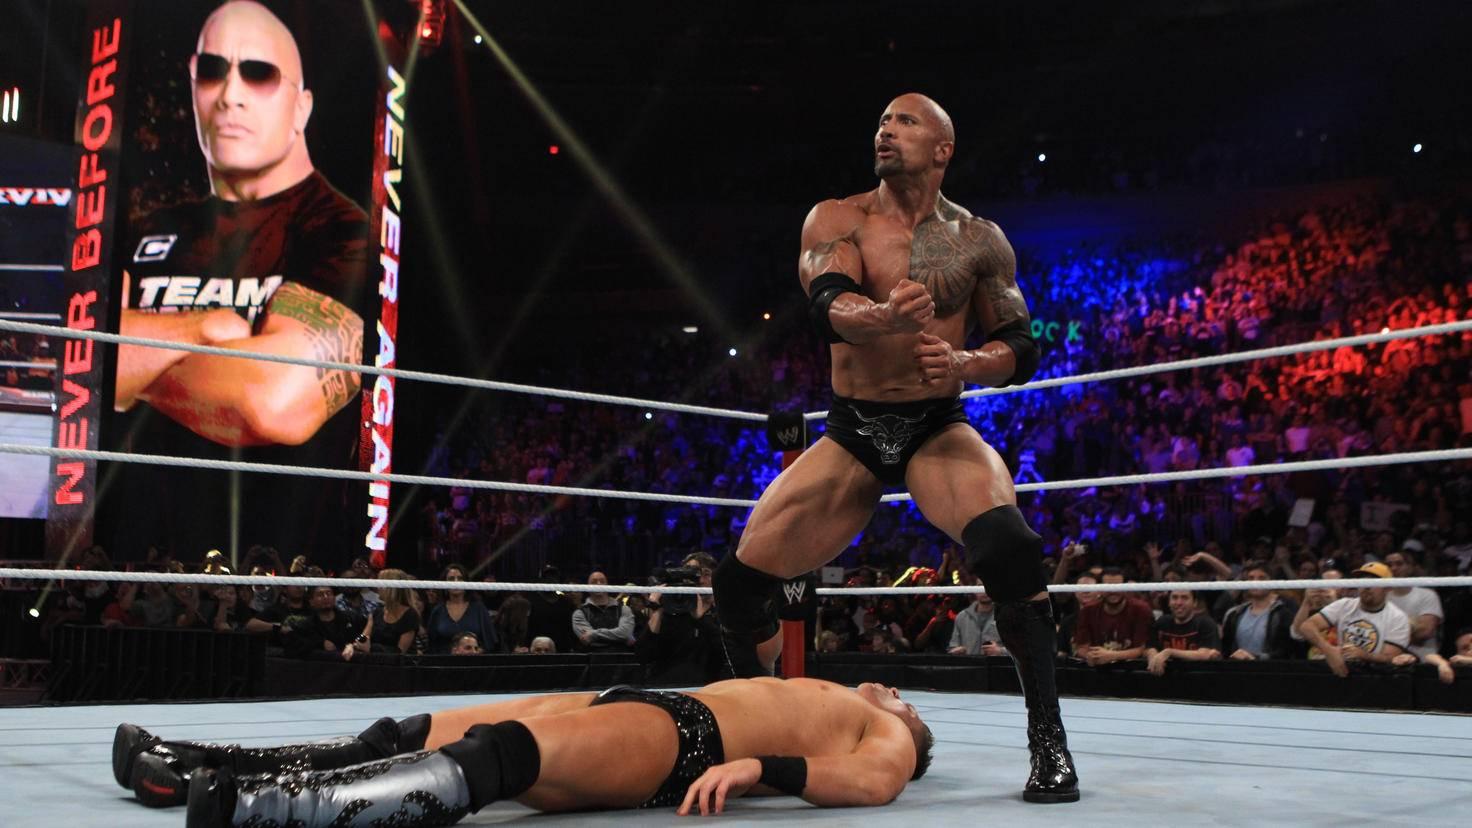 Dwayne Johnson-WrestleMania 28296000 picture alliance 2011